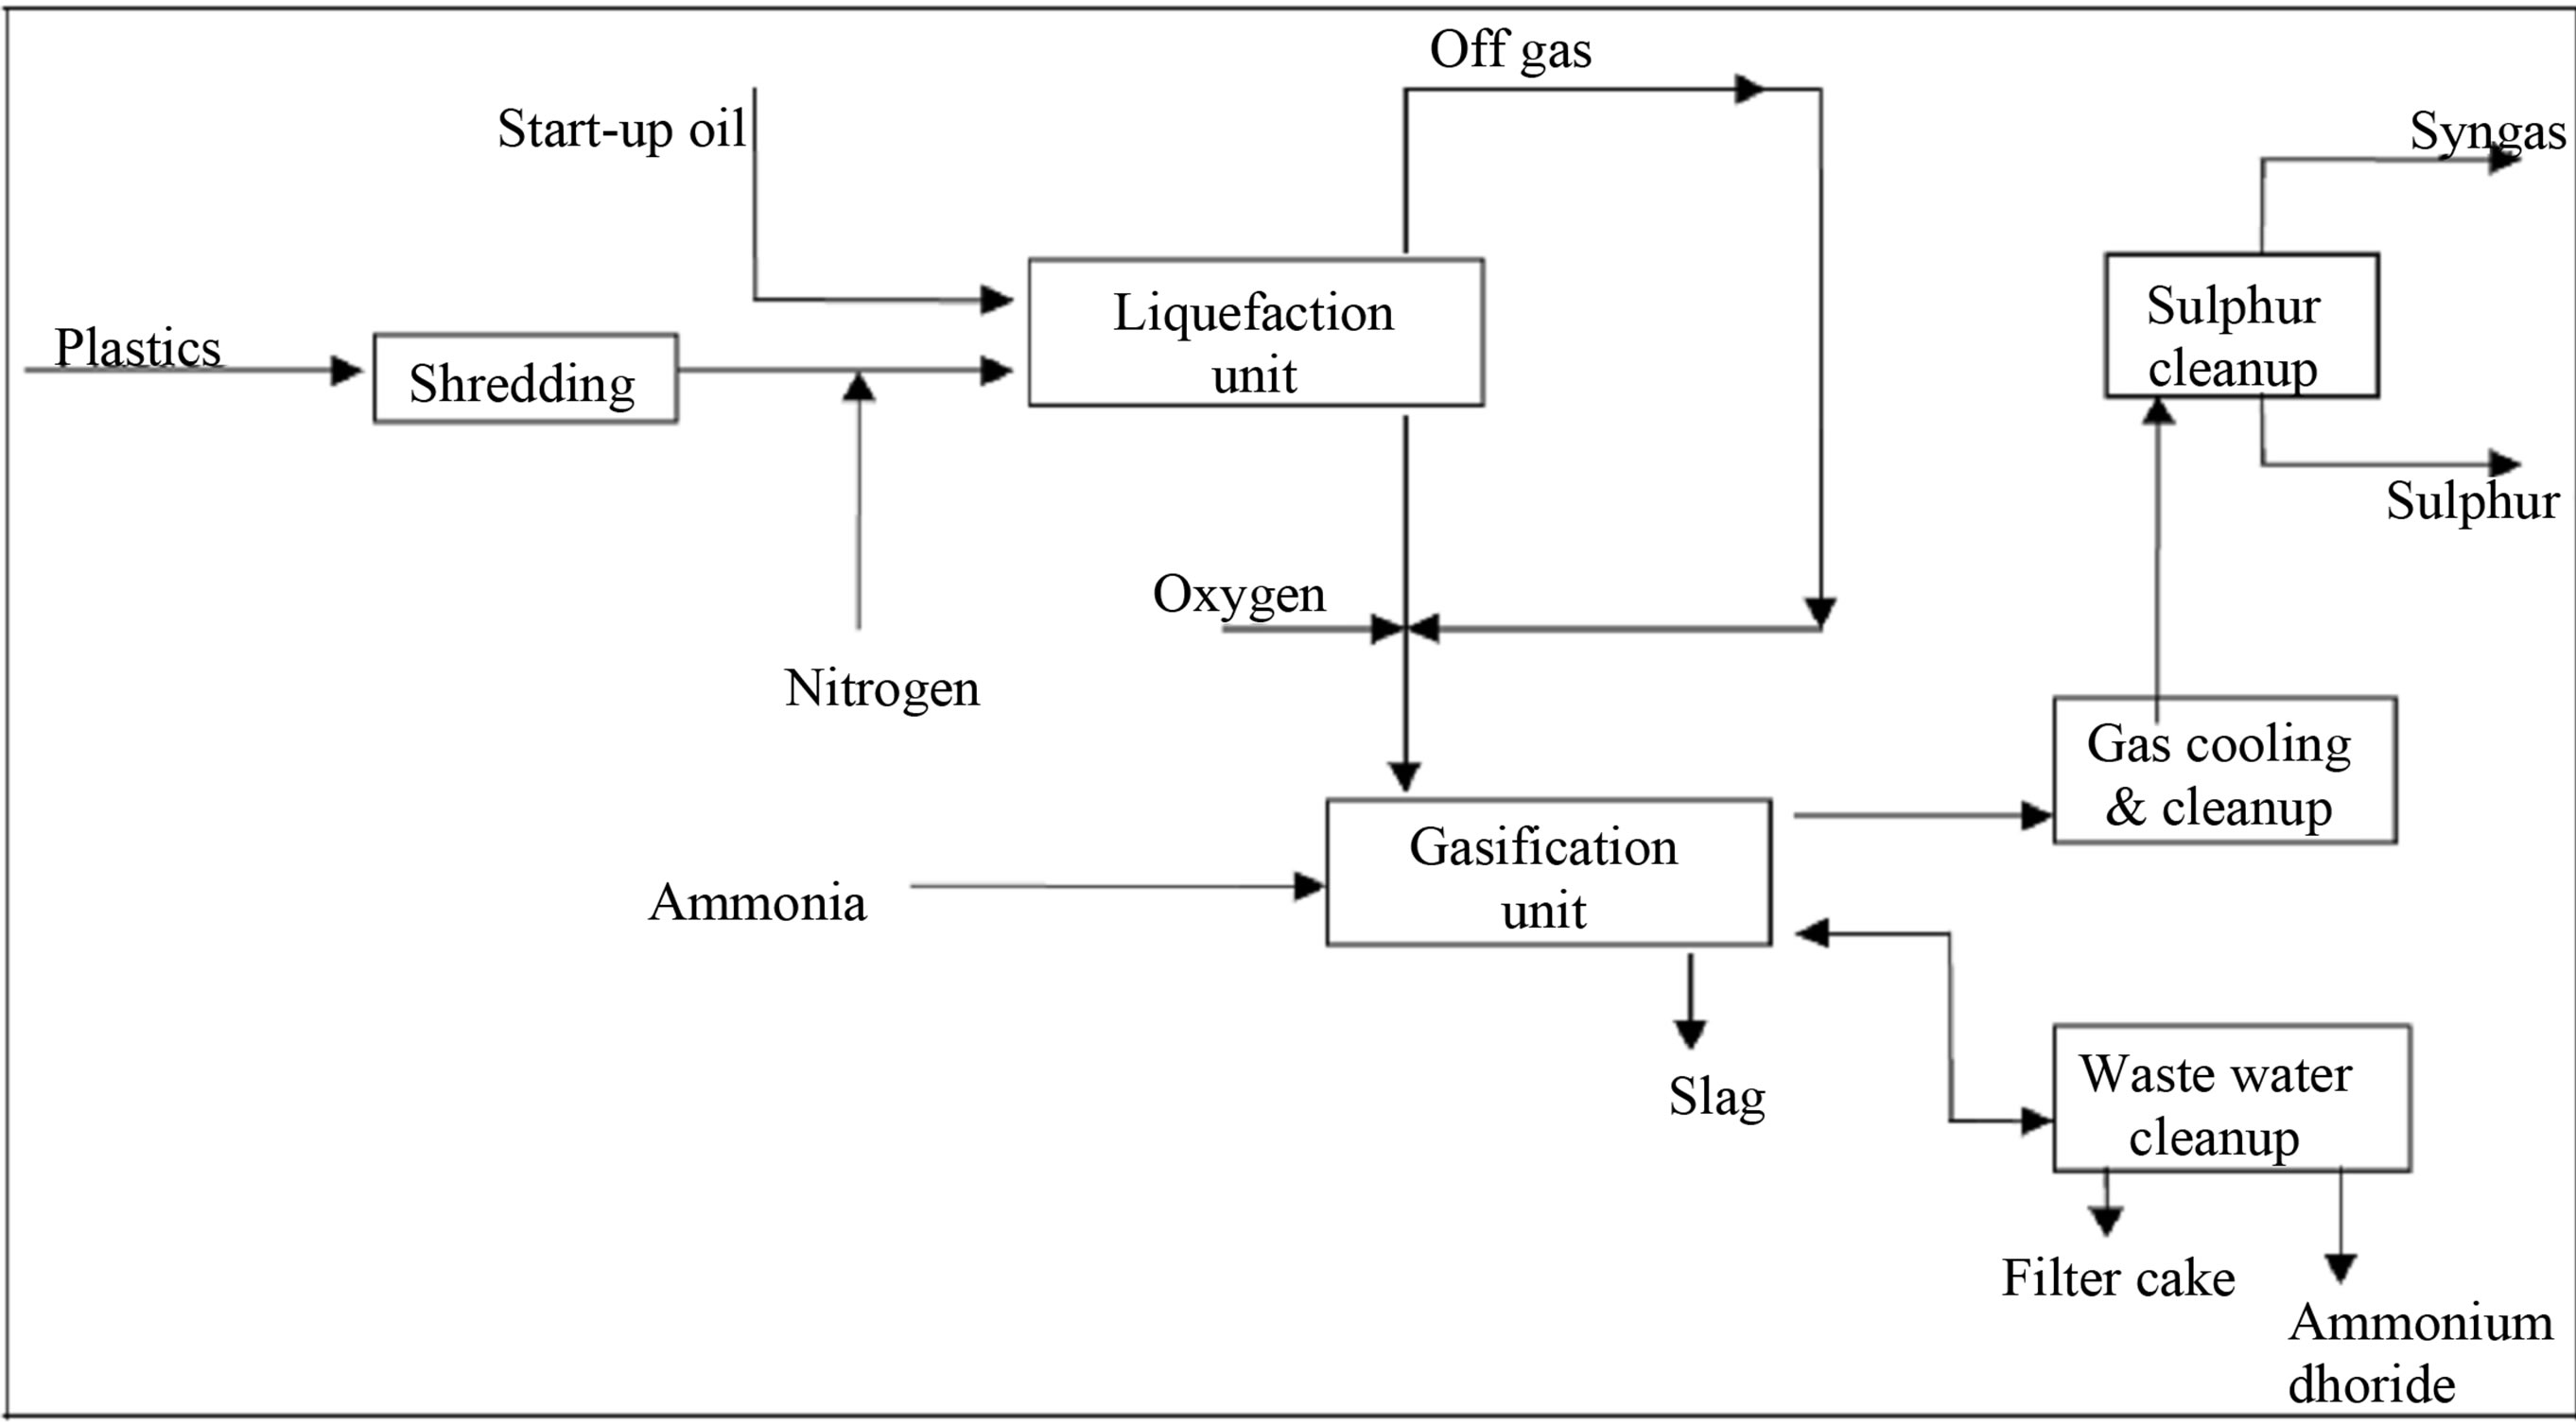 fios tv wiring diagram wiring diagram